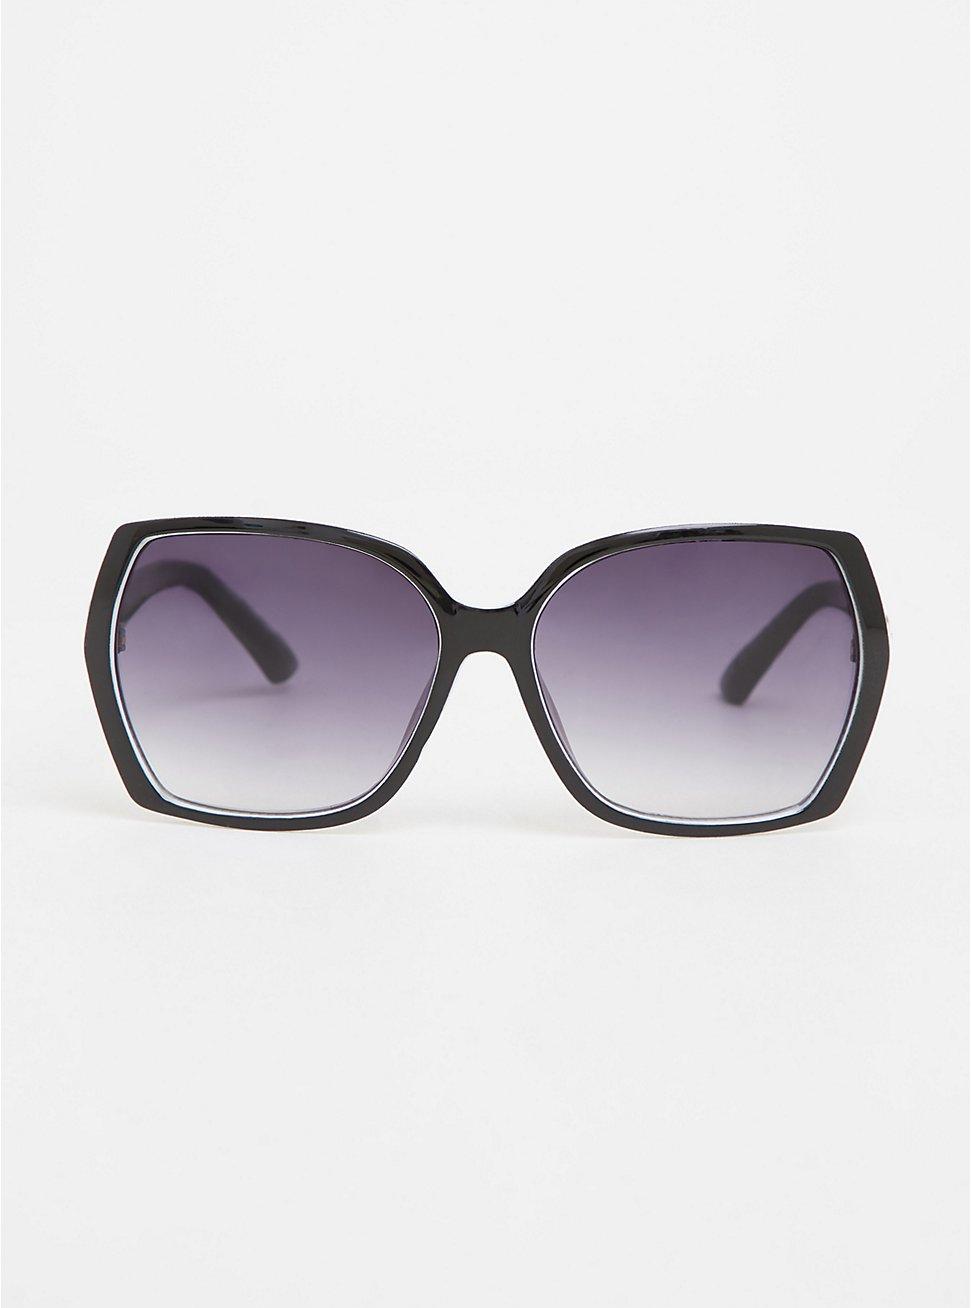 Black & White Rectangle Sunglasses, , hi-res